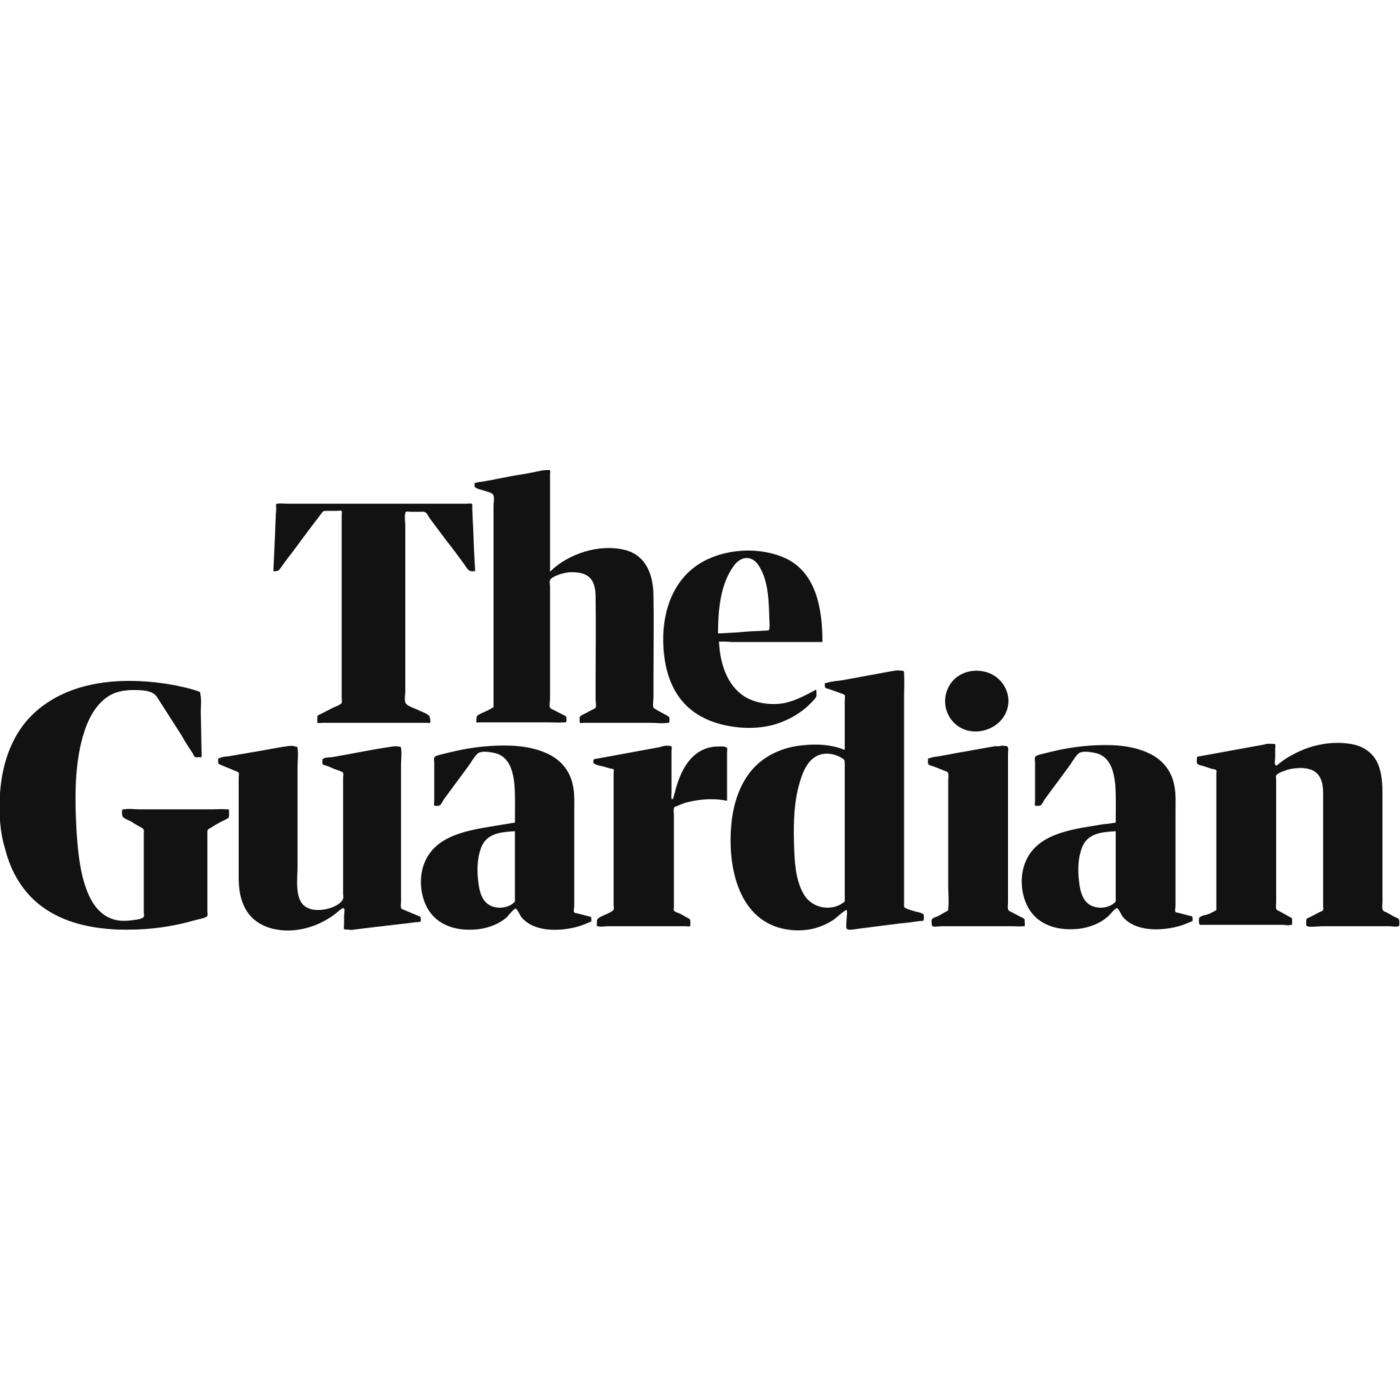 Guardian 1400 1400.png